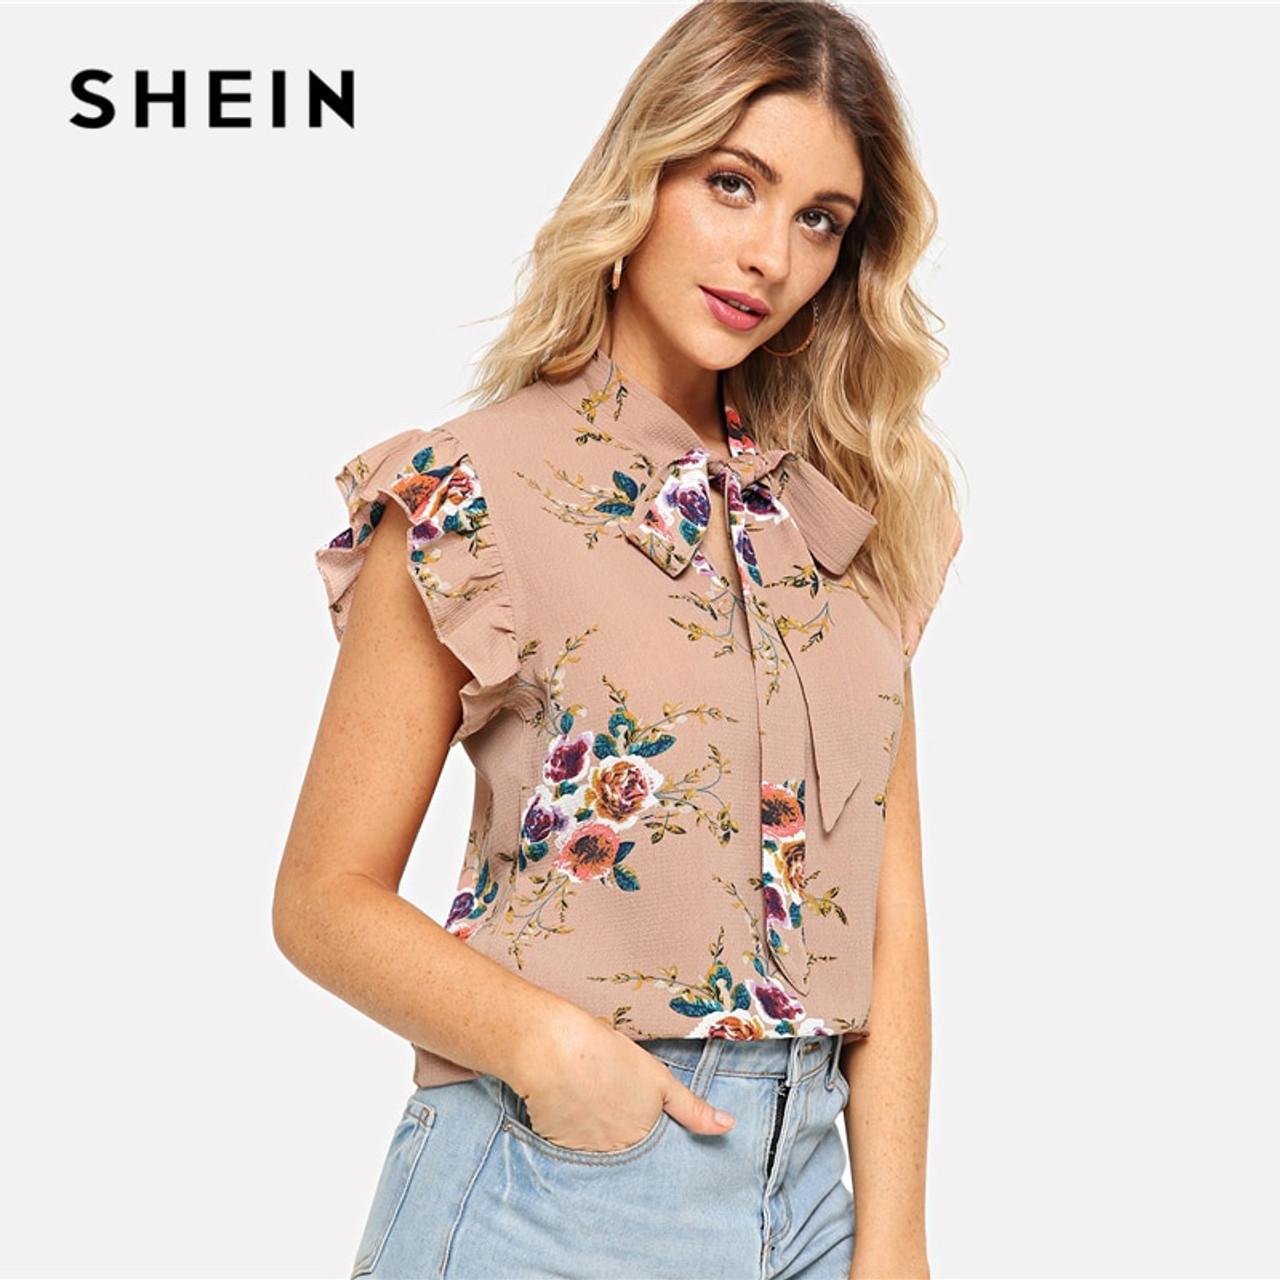 91e935331d8b SHEIN Flounce Shoulder Tied Neck Floral Blouse Pink Ruffle Sleeveless  Chiffon Blouses Women Summer Casual Elegant .